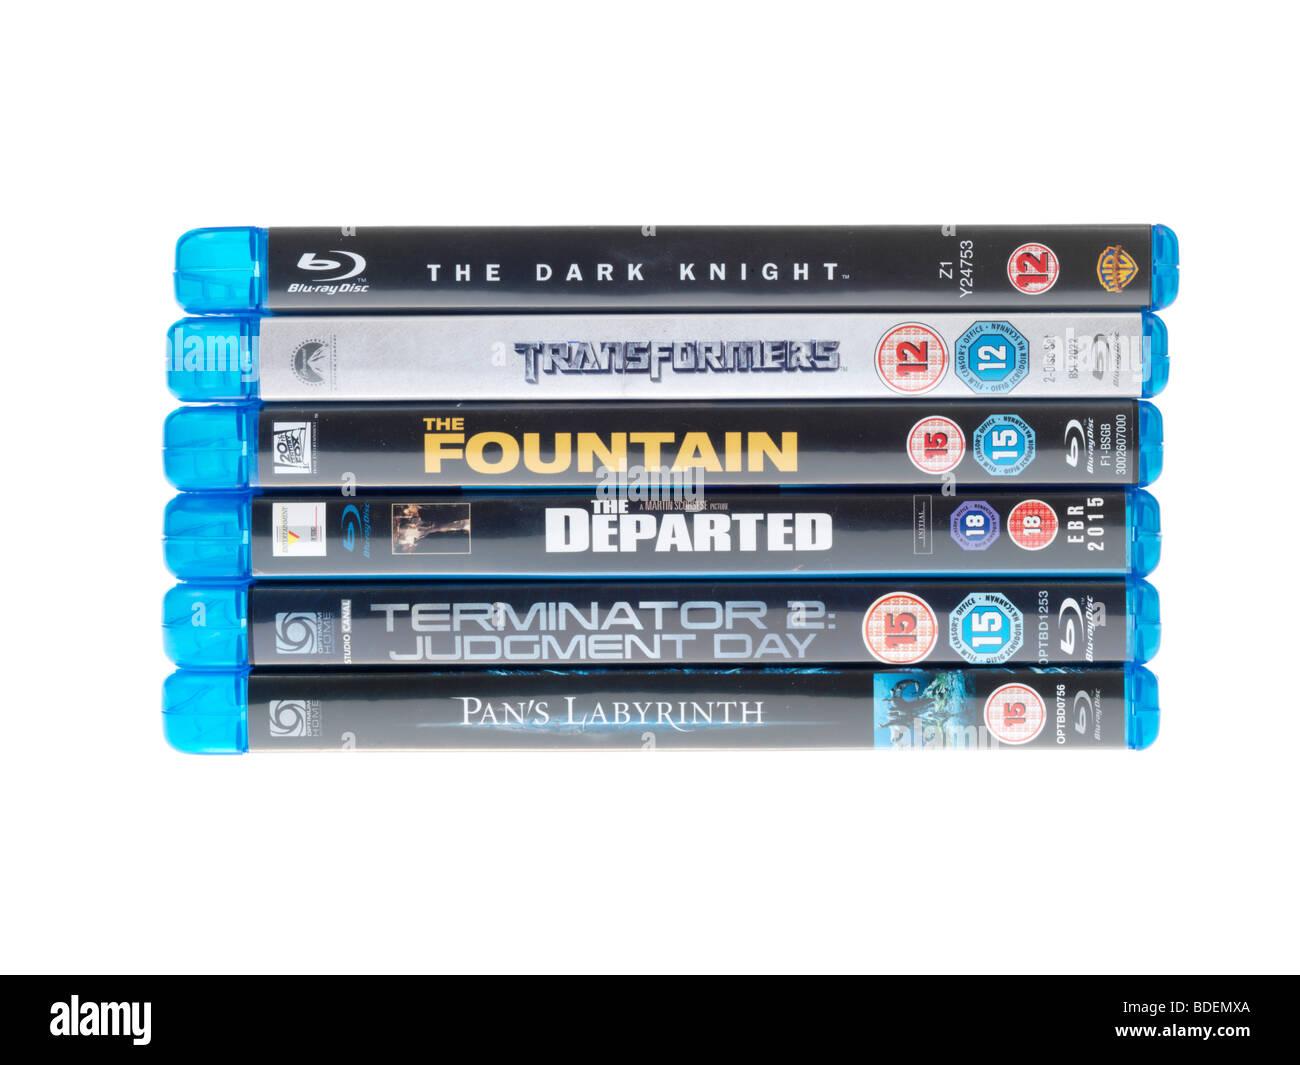 Blu Ray Discs - Stock Image